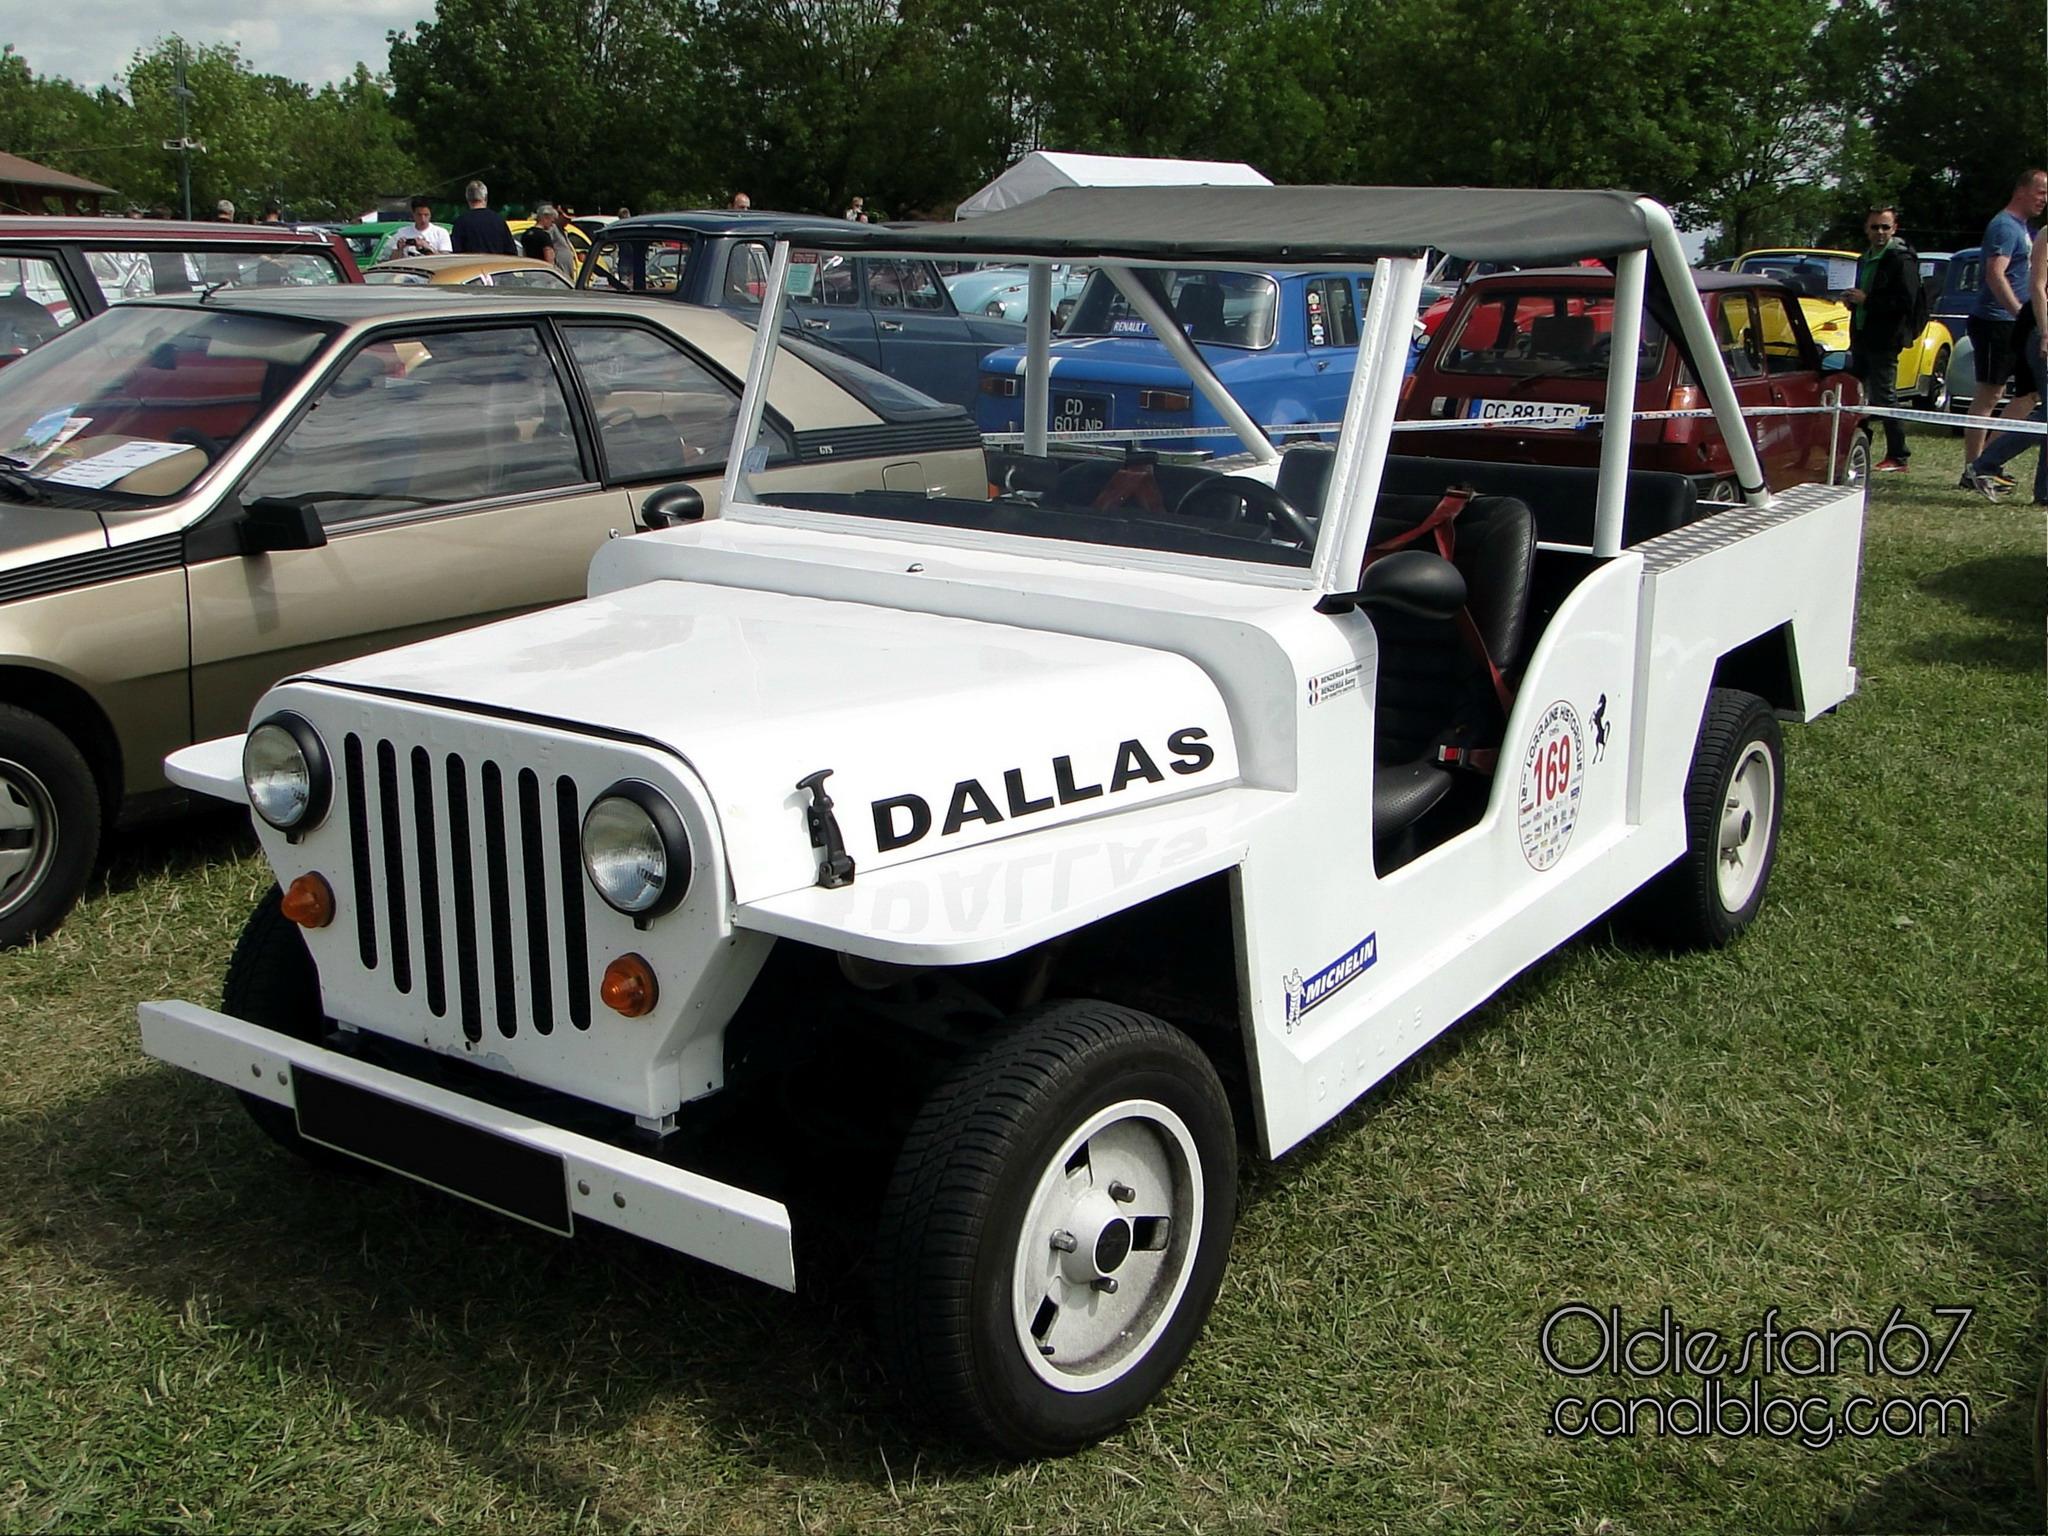 jeep reviews ram dallas duncanville mr freedom htm customer testimonials chrysler in dodge